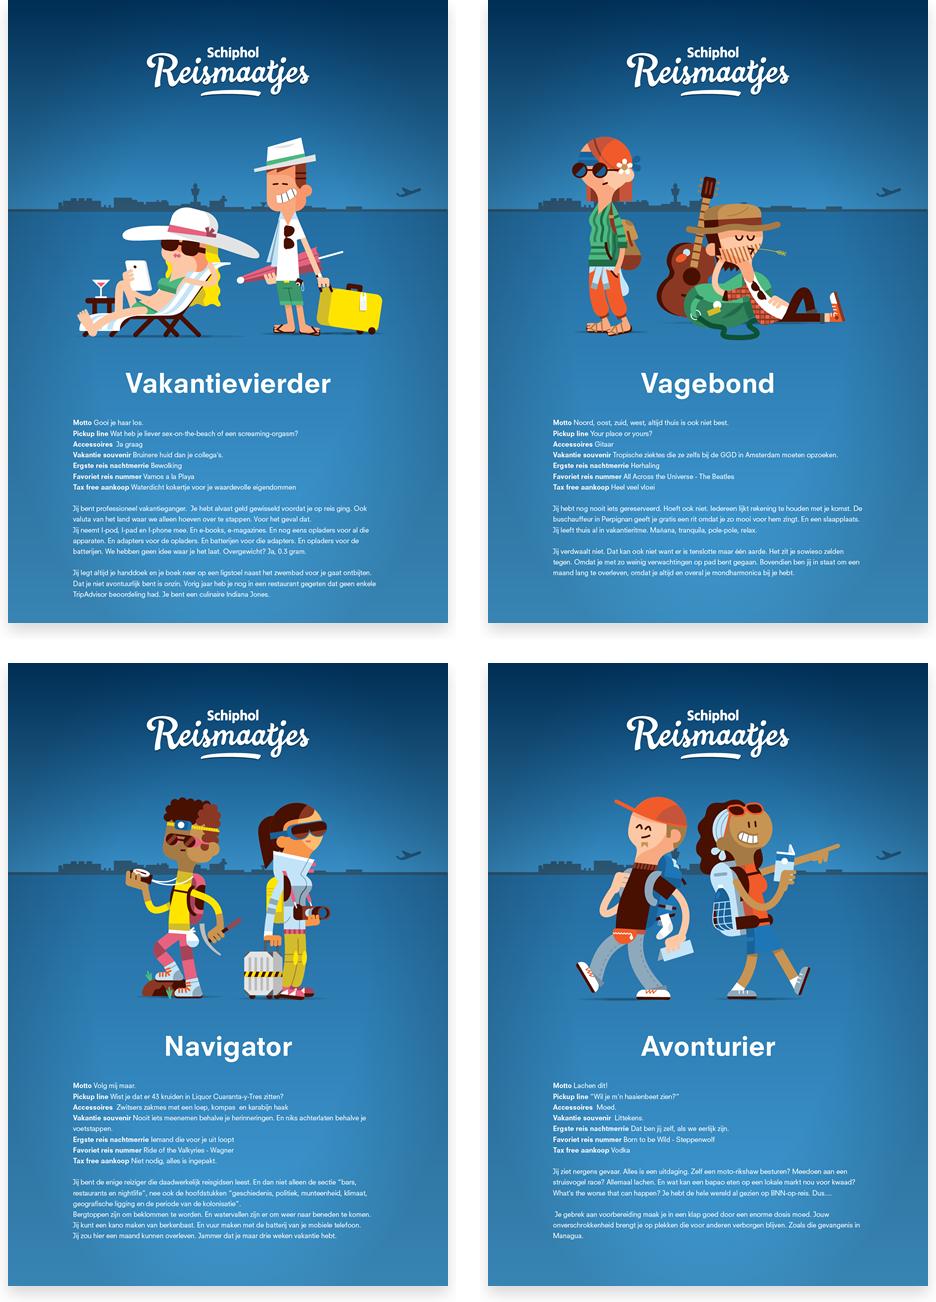 schiphol_reismaatjes-fb_app-karakters